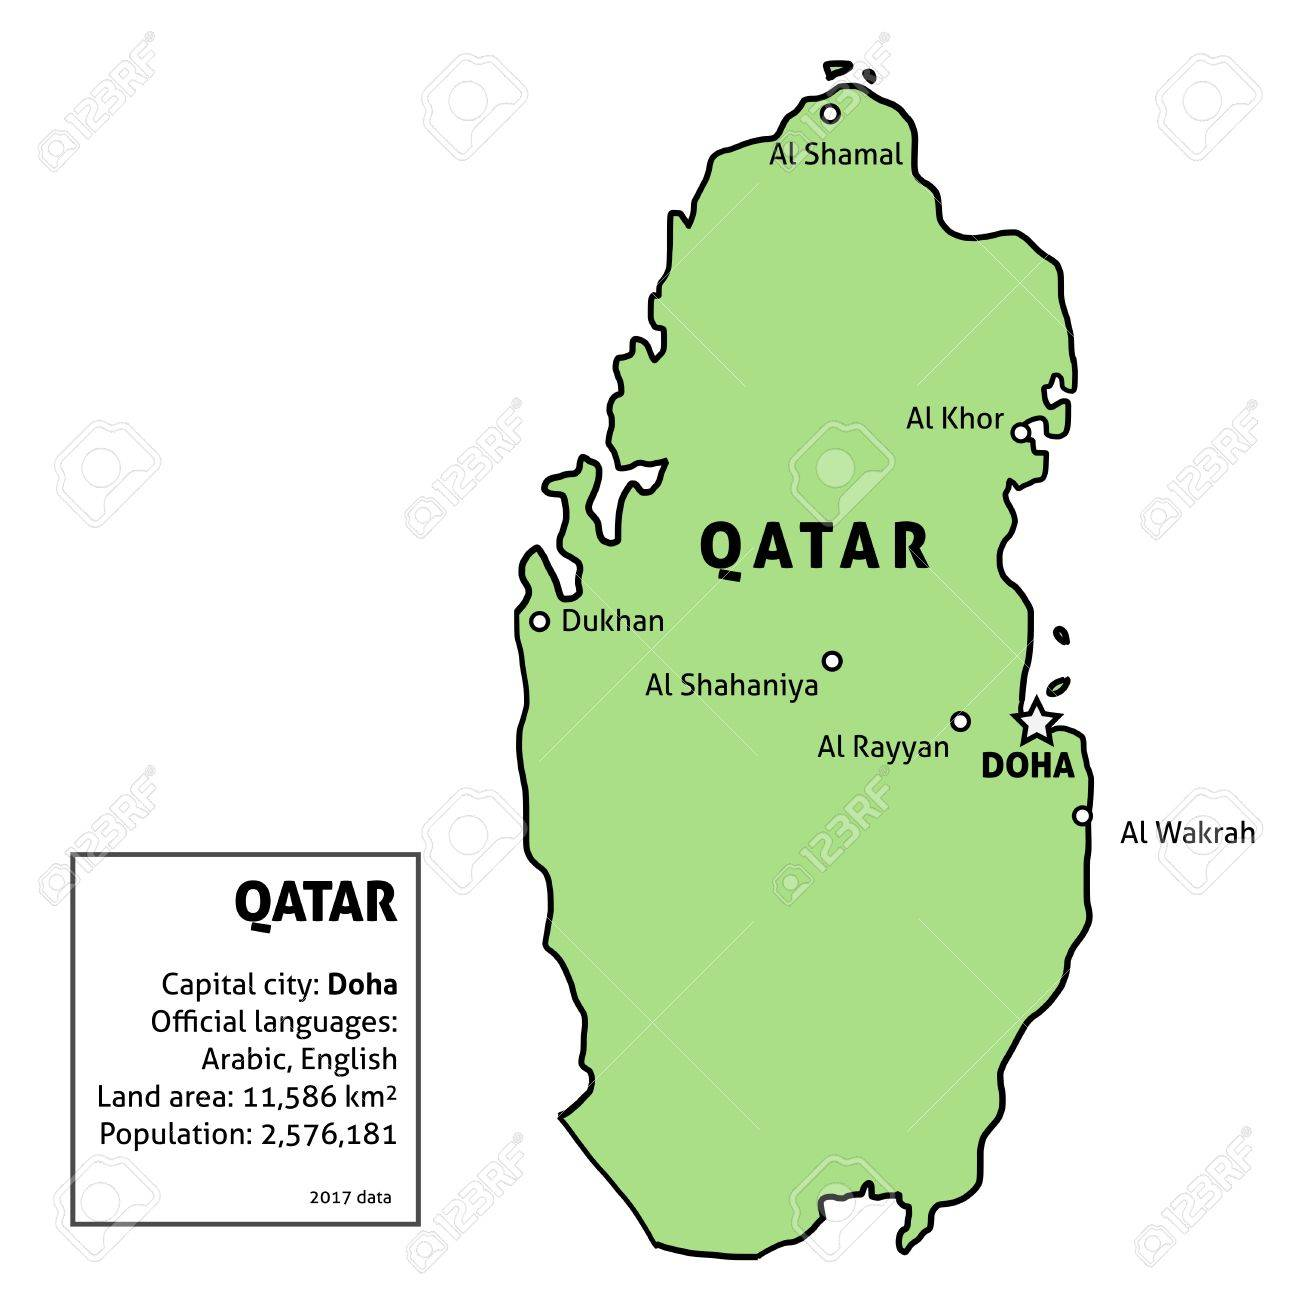 Qatar Map. Outline Illustration Country Map With Main Cities ... on kenya map, angola map, luxembourg map, middle east map, bahrain map, namibia map, japan map, rwanda map, asia map, zimbabwe map, united arab emirates map, madagascar map, uganda map, balkans map, kuwait map, algeria map, turkey map, malawi map, niger map, ghana map, senegal map, u.a.e. map, cameroon map, ethiopia map, jordan map, mozambique map, tunisia map, abu dhabi map, asian countries map, syria map, burundi map, sudan map, dubai map, morocco map, aruba map, mali map, israel map, iraq map, persian gulf map,